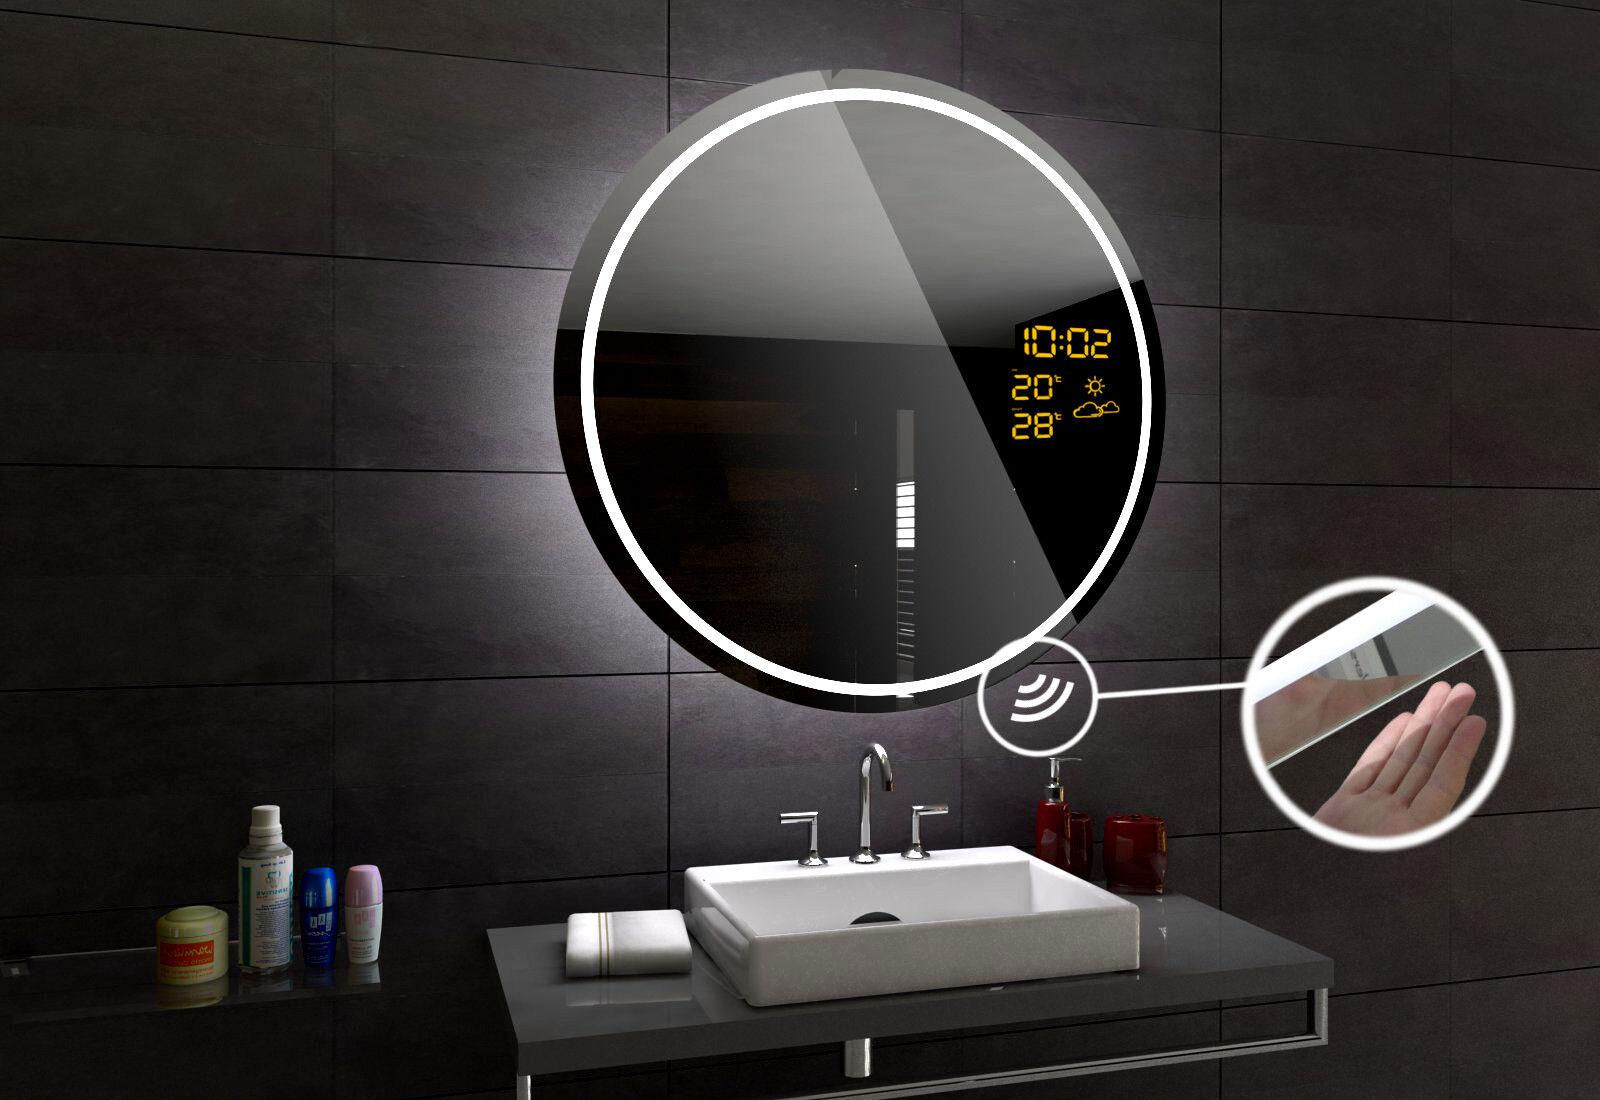 LONDON Miroir Salle Salle Salle De Bain Lumineux LED   Interrupteur Accessoires Miroir ROND 31cbd1